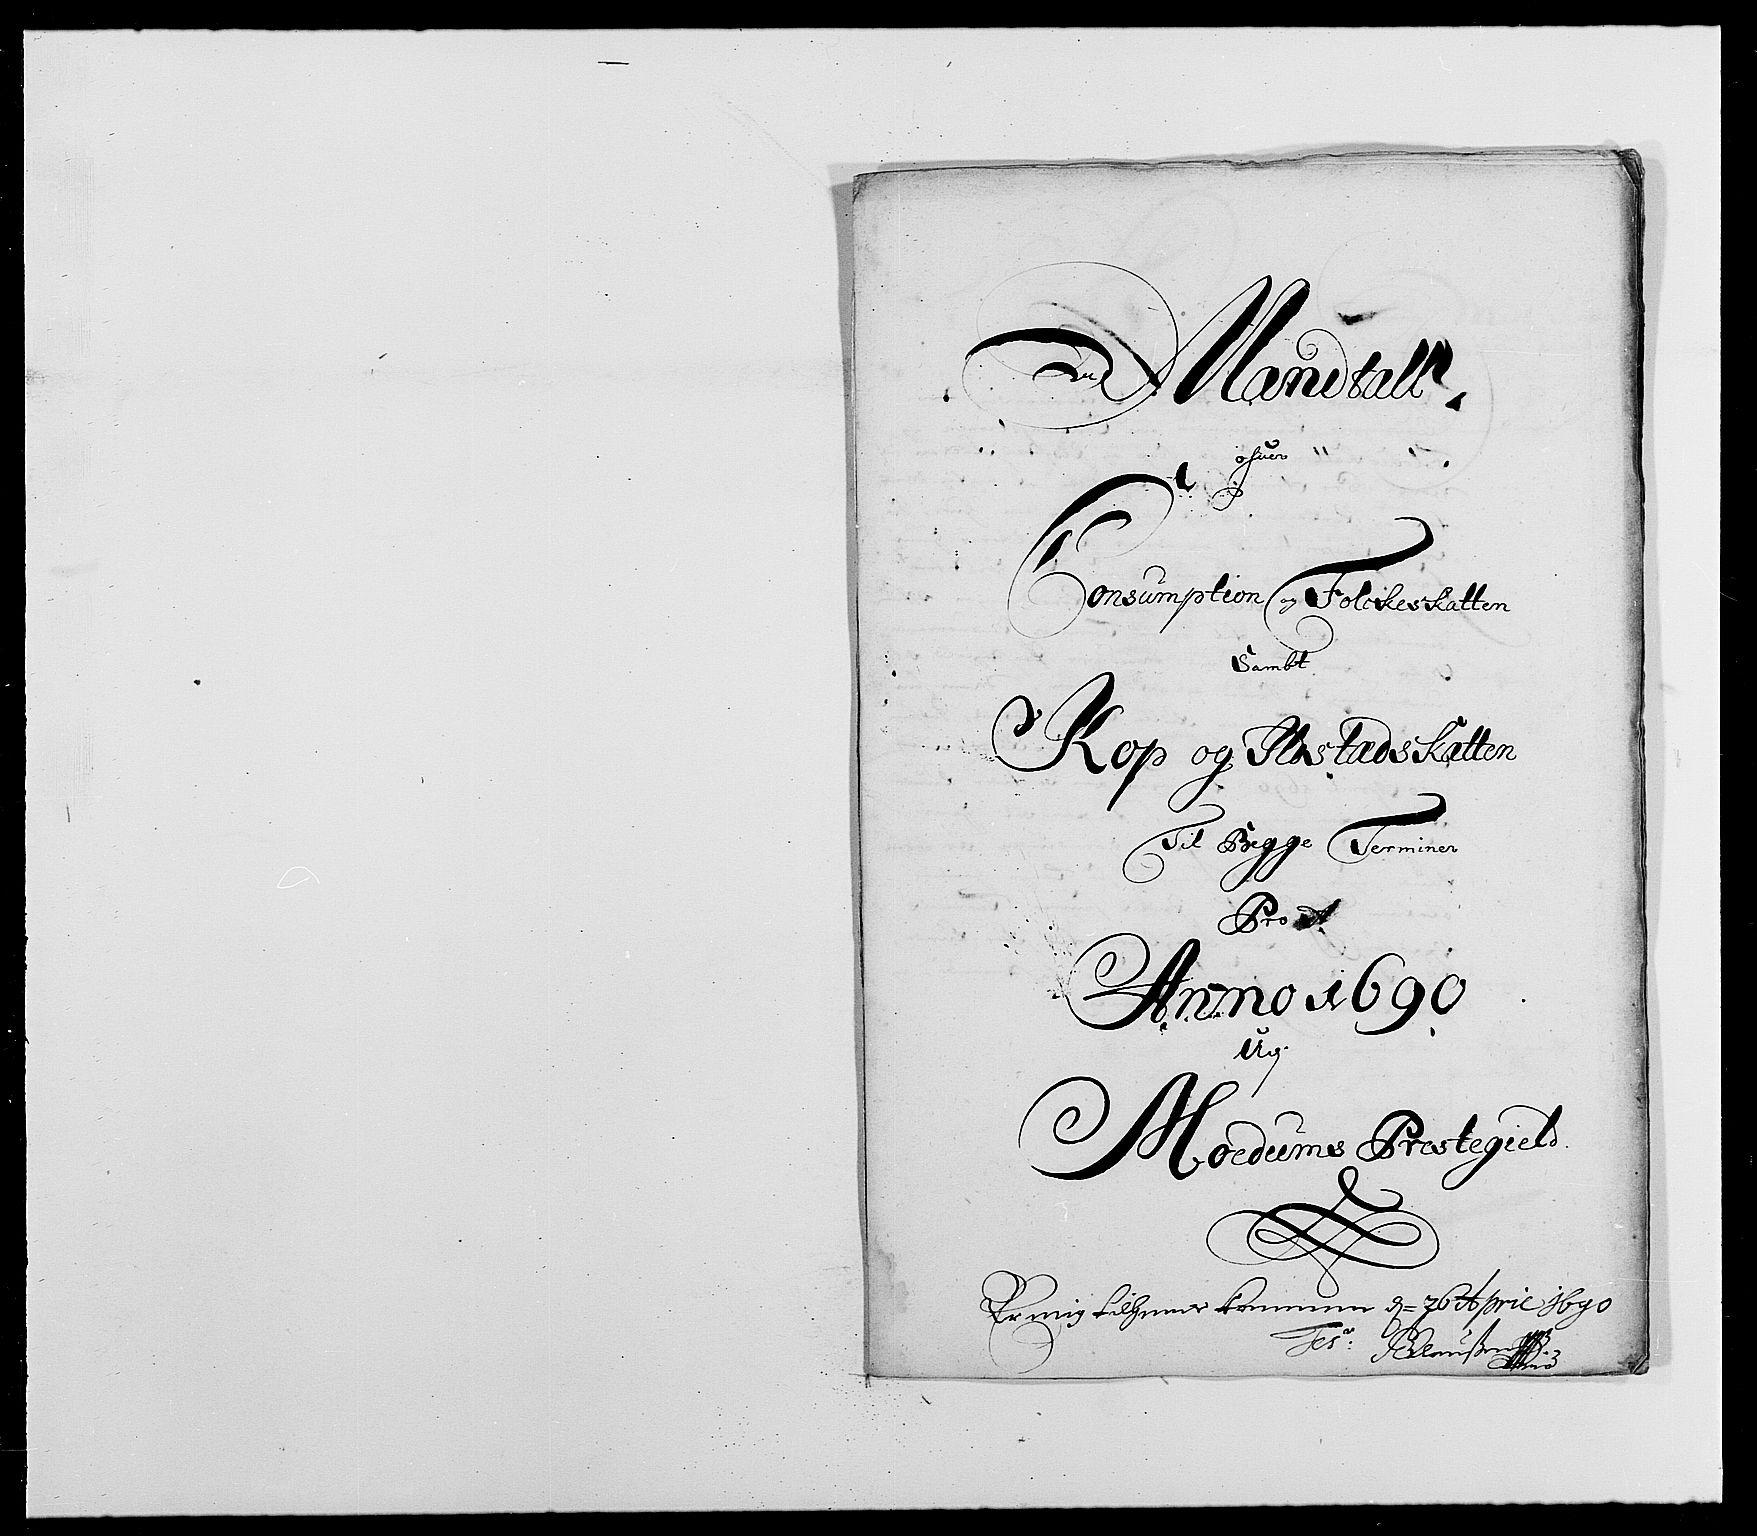 RA, Rentekammeret inntil 1814, Reviderte regnskaper, Fogderegnskap, R25/L1680: Fogderegnskap Buskerud, 1689-1690, s. 443